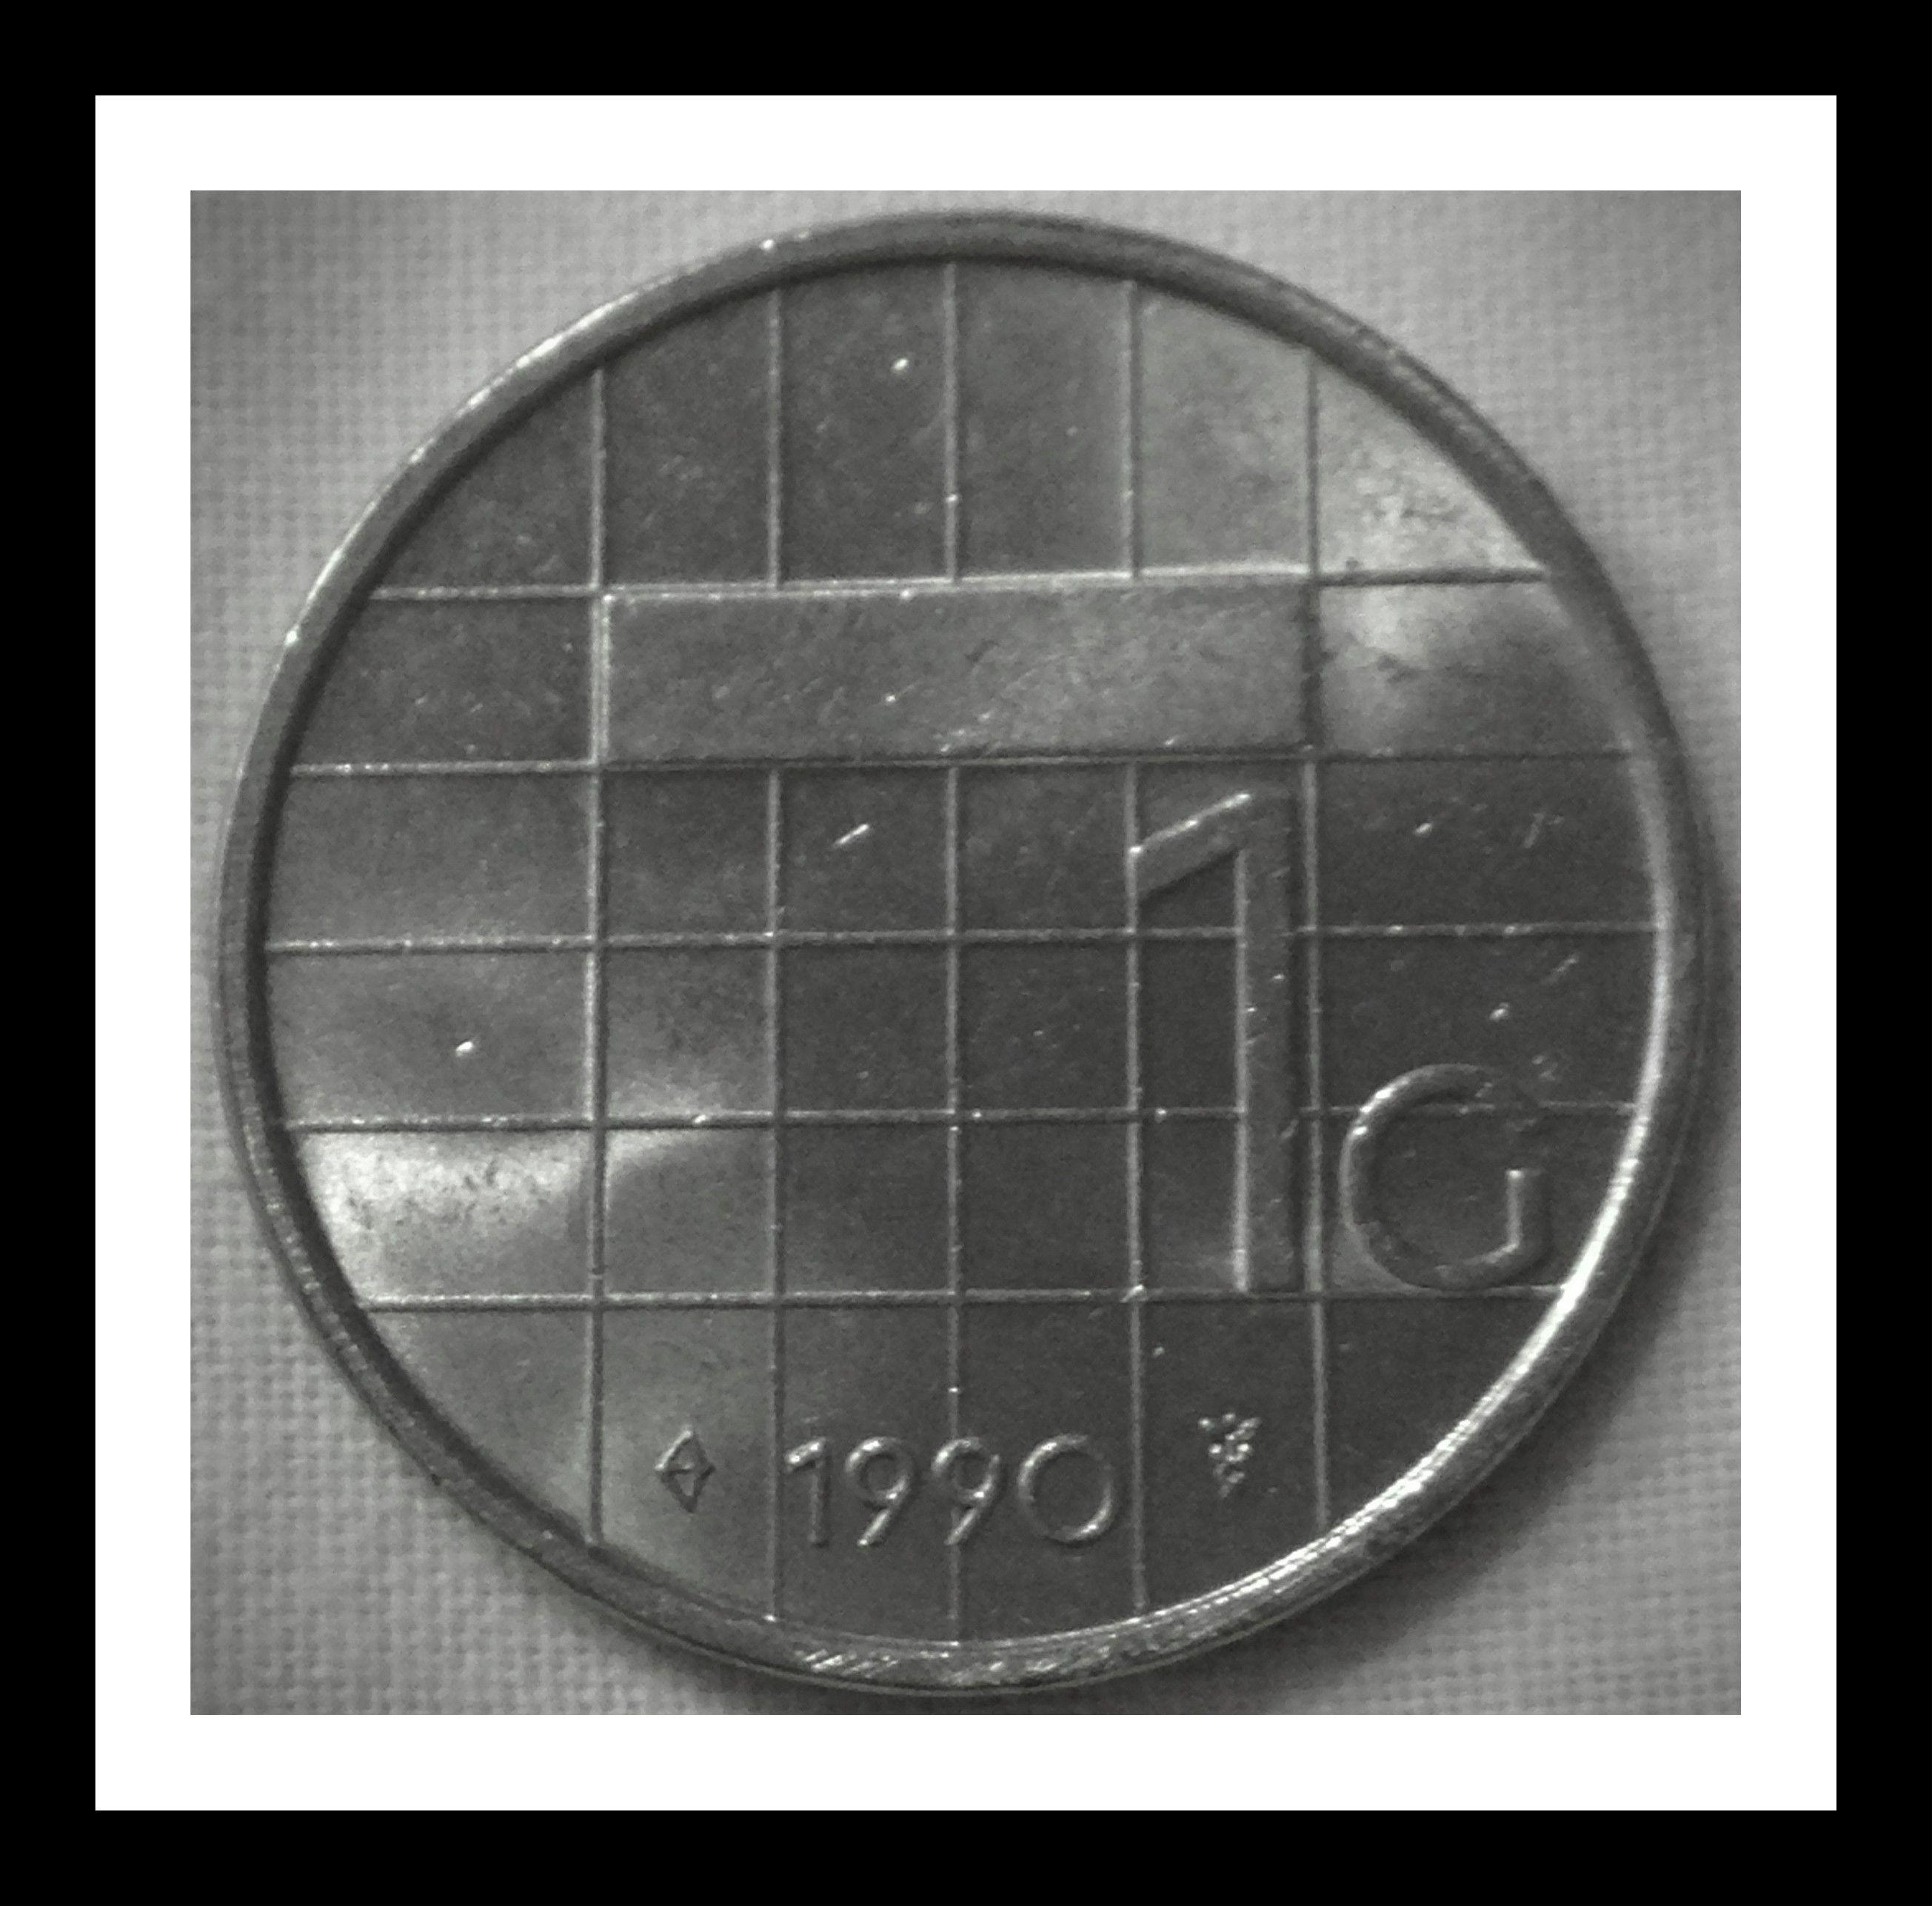 Netherlands 1 Guilder 1990 Condition F The Guilder Was Hollands